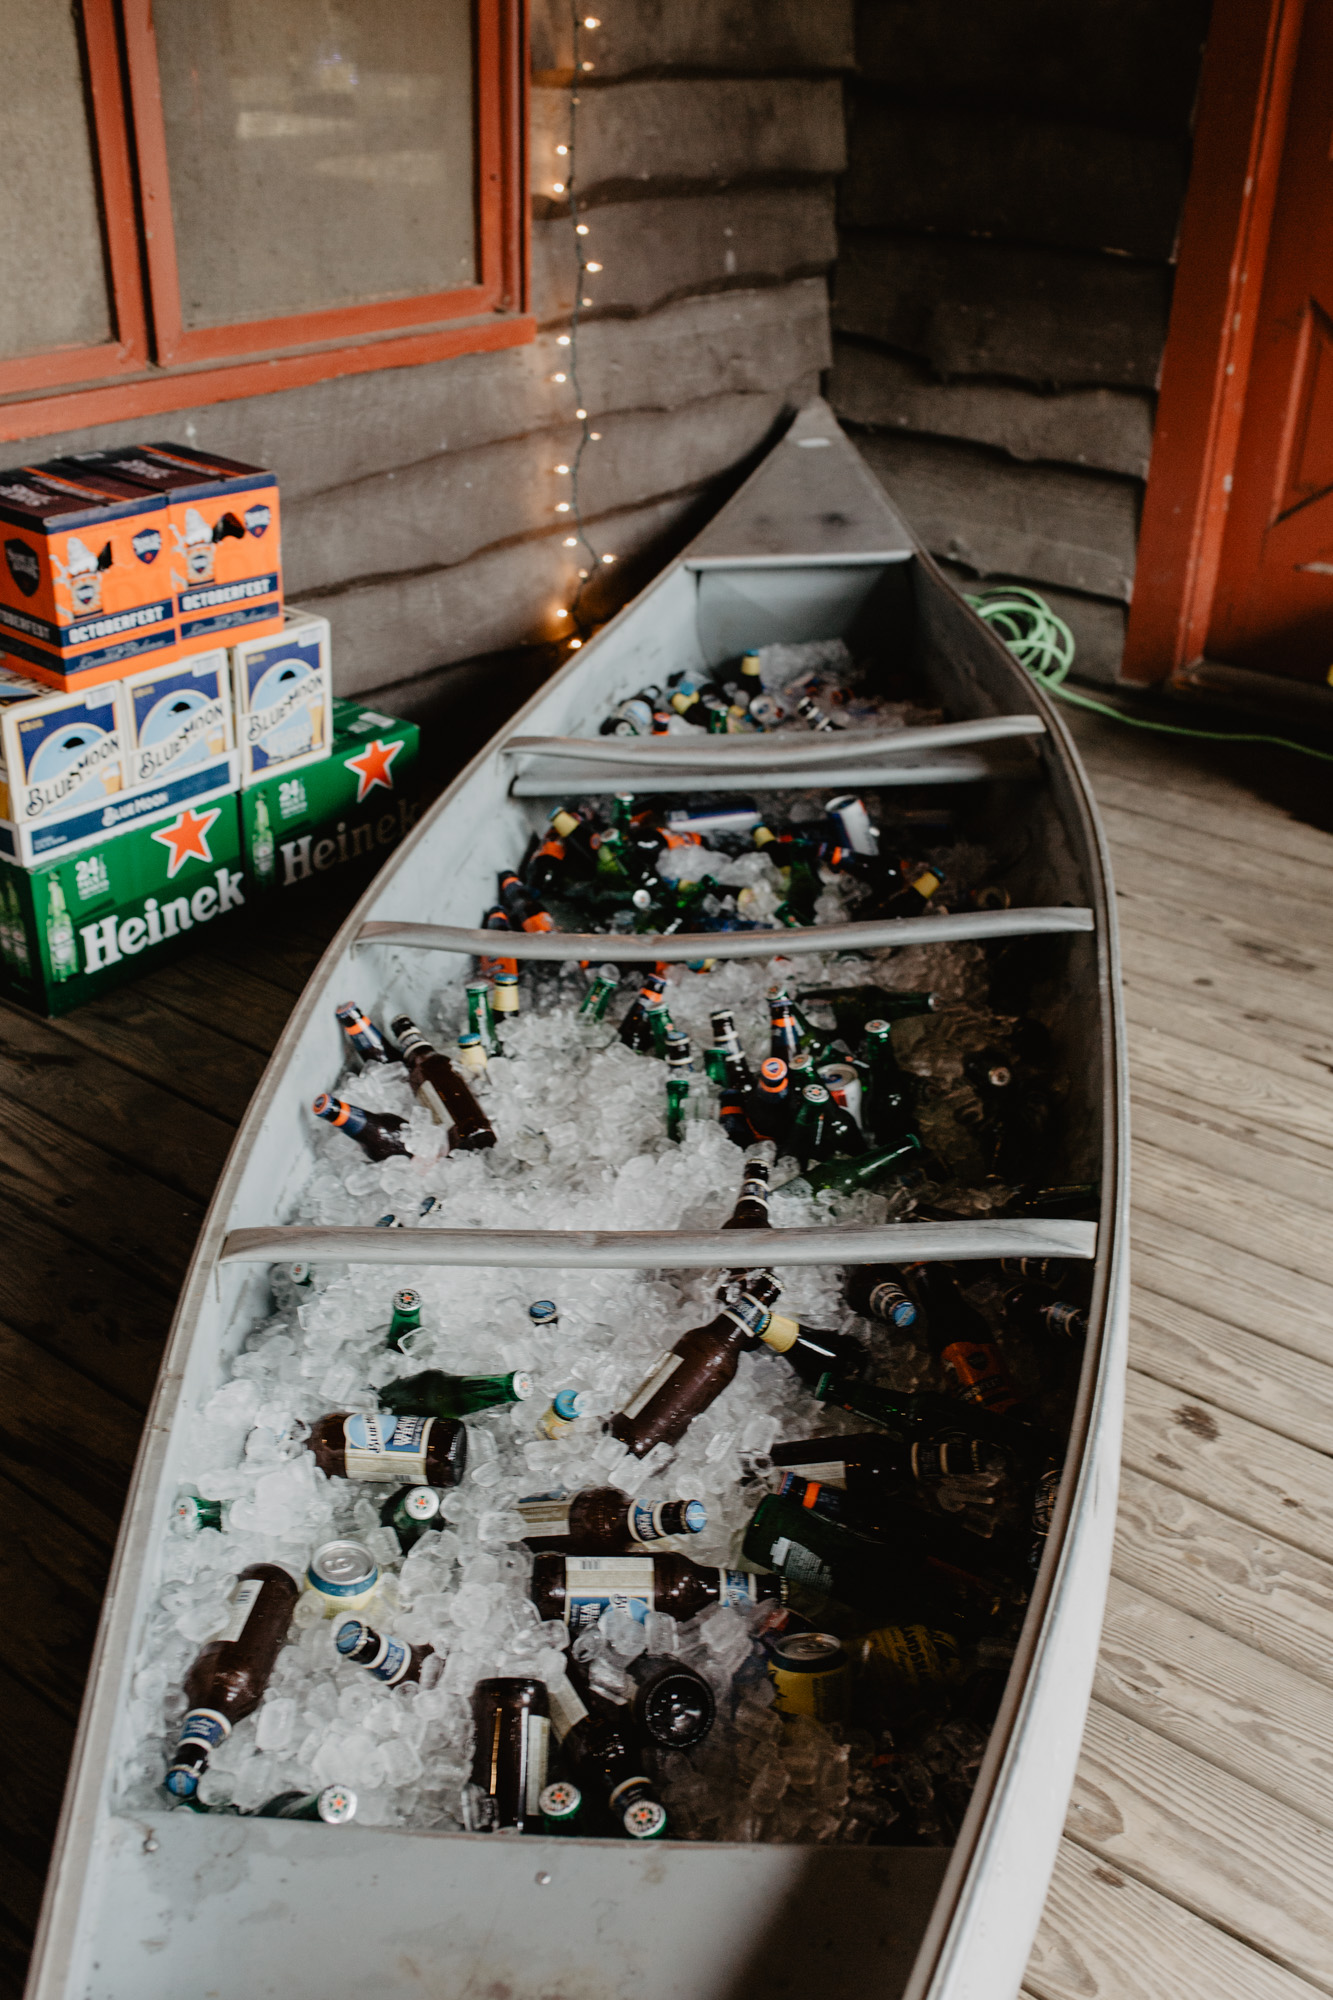 A canoe serves as a drink cooler